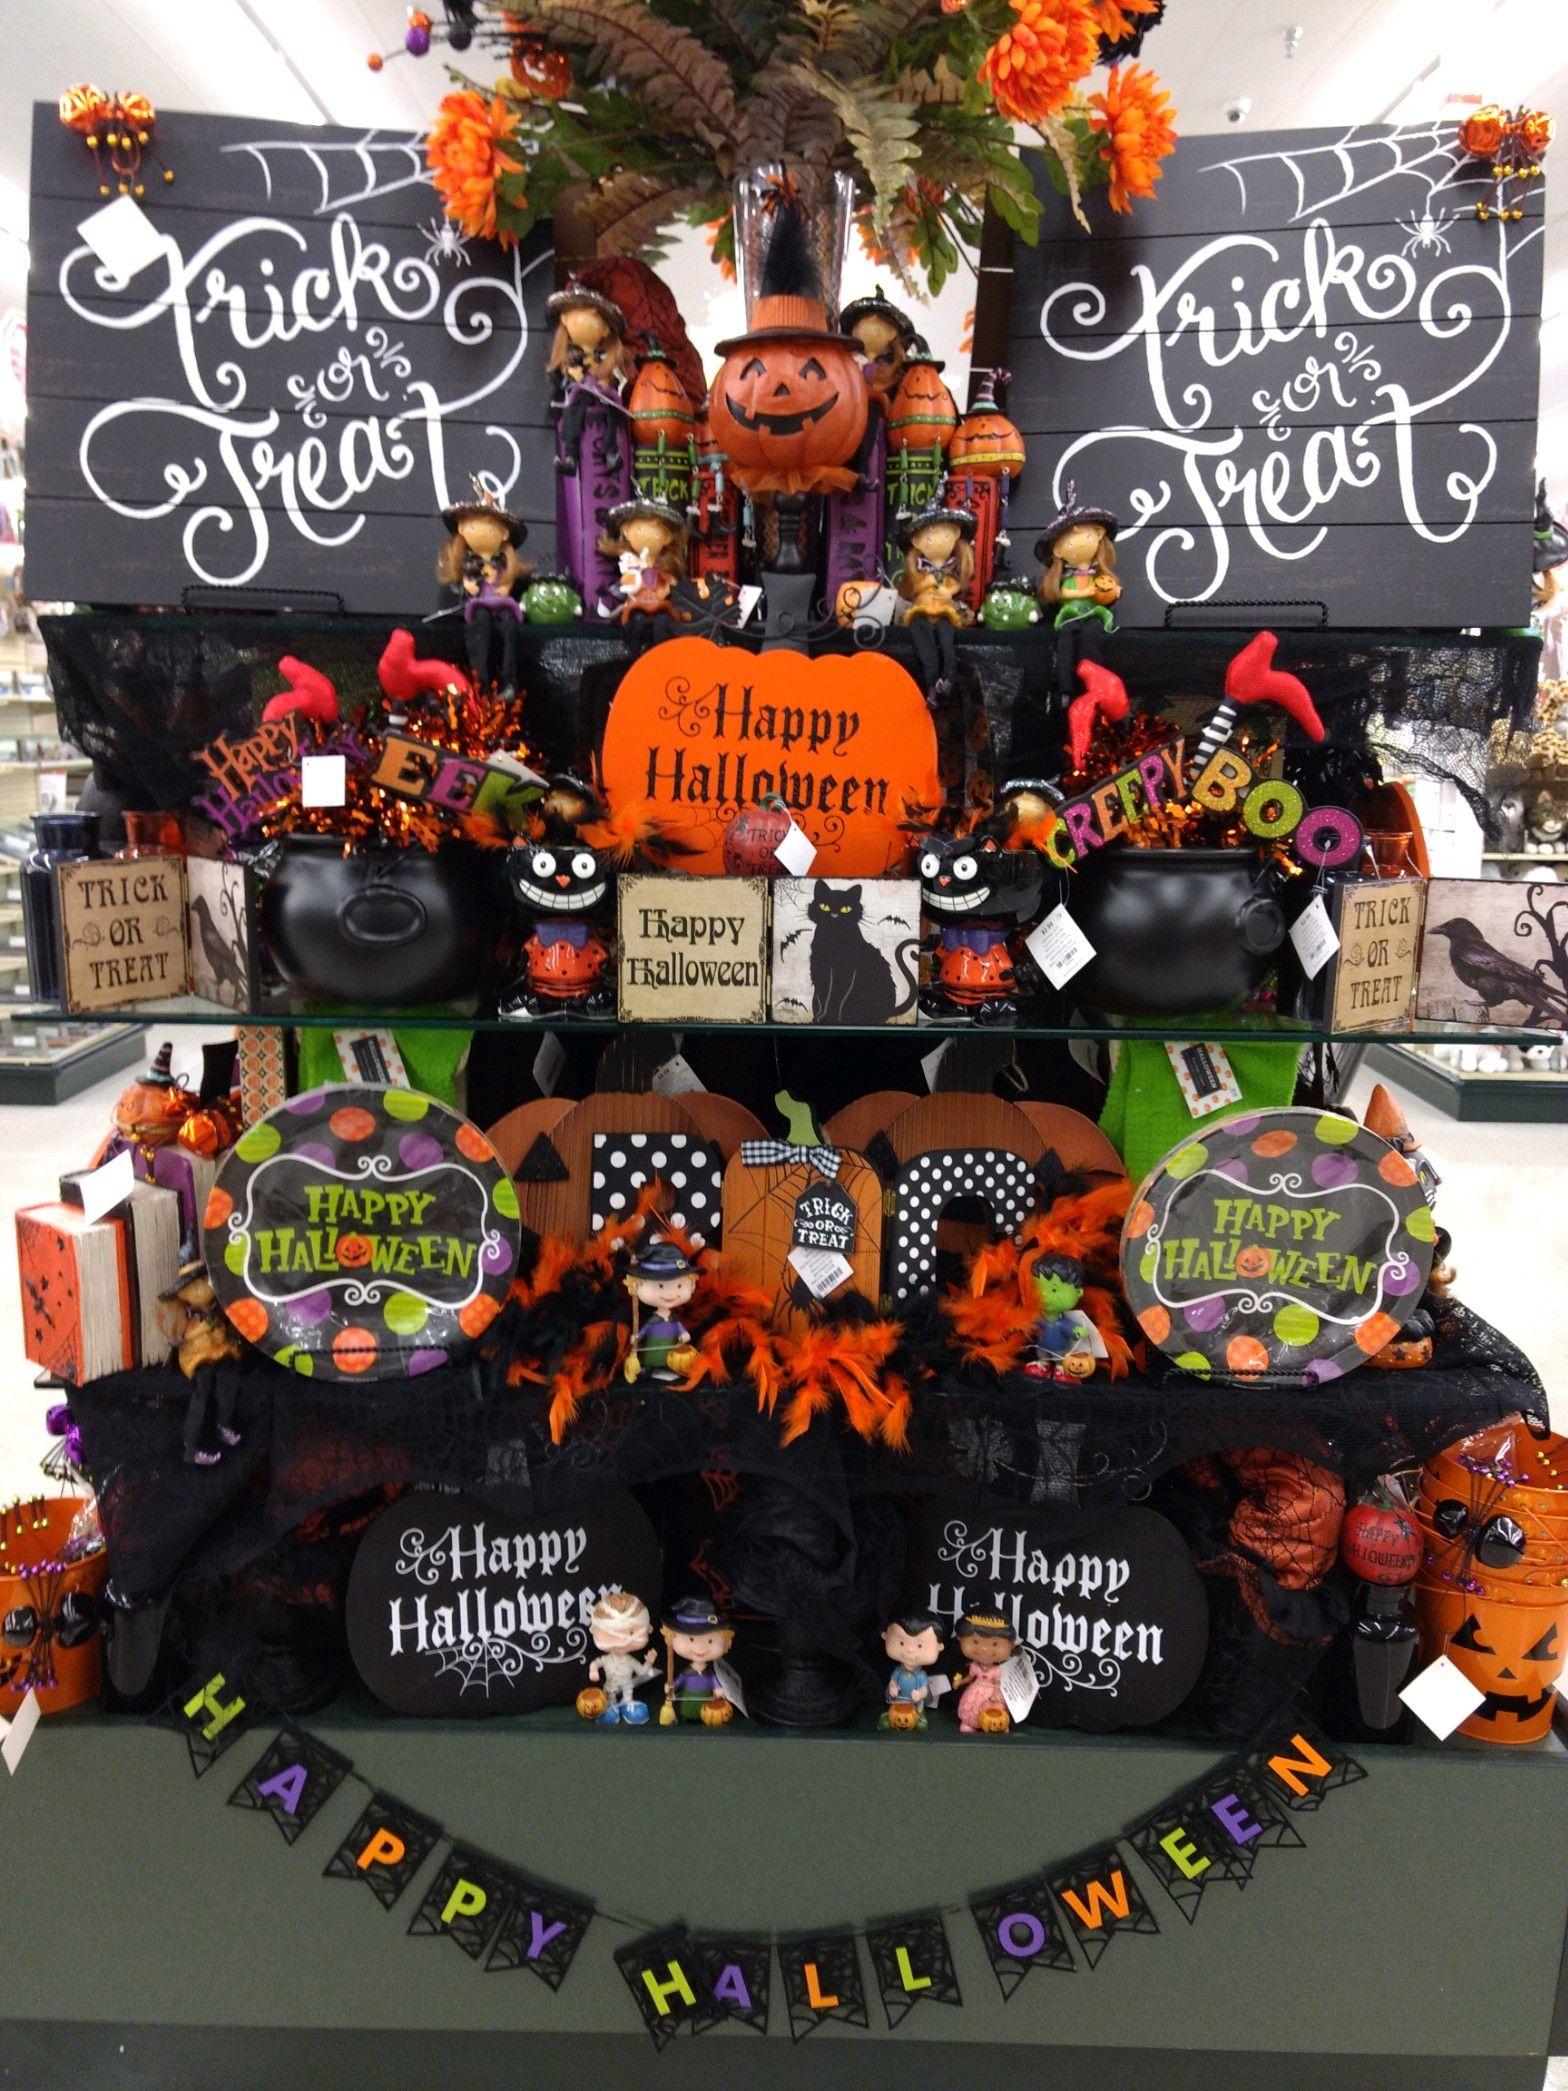 Hobby Lobby Halloween Halloween decorations, Halloween